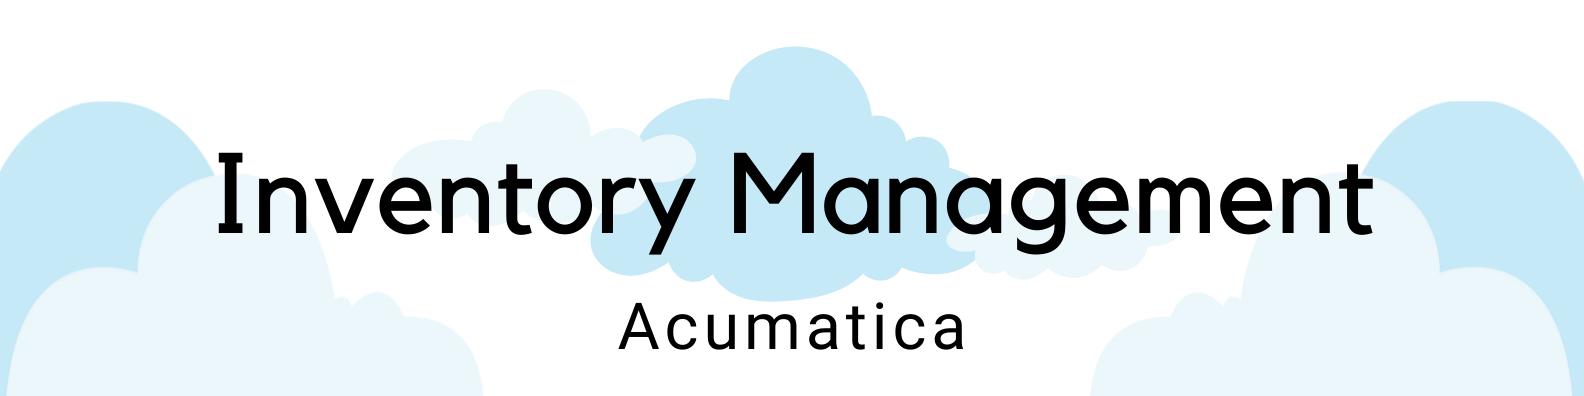 Inventory Management Acumatica header ICAN